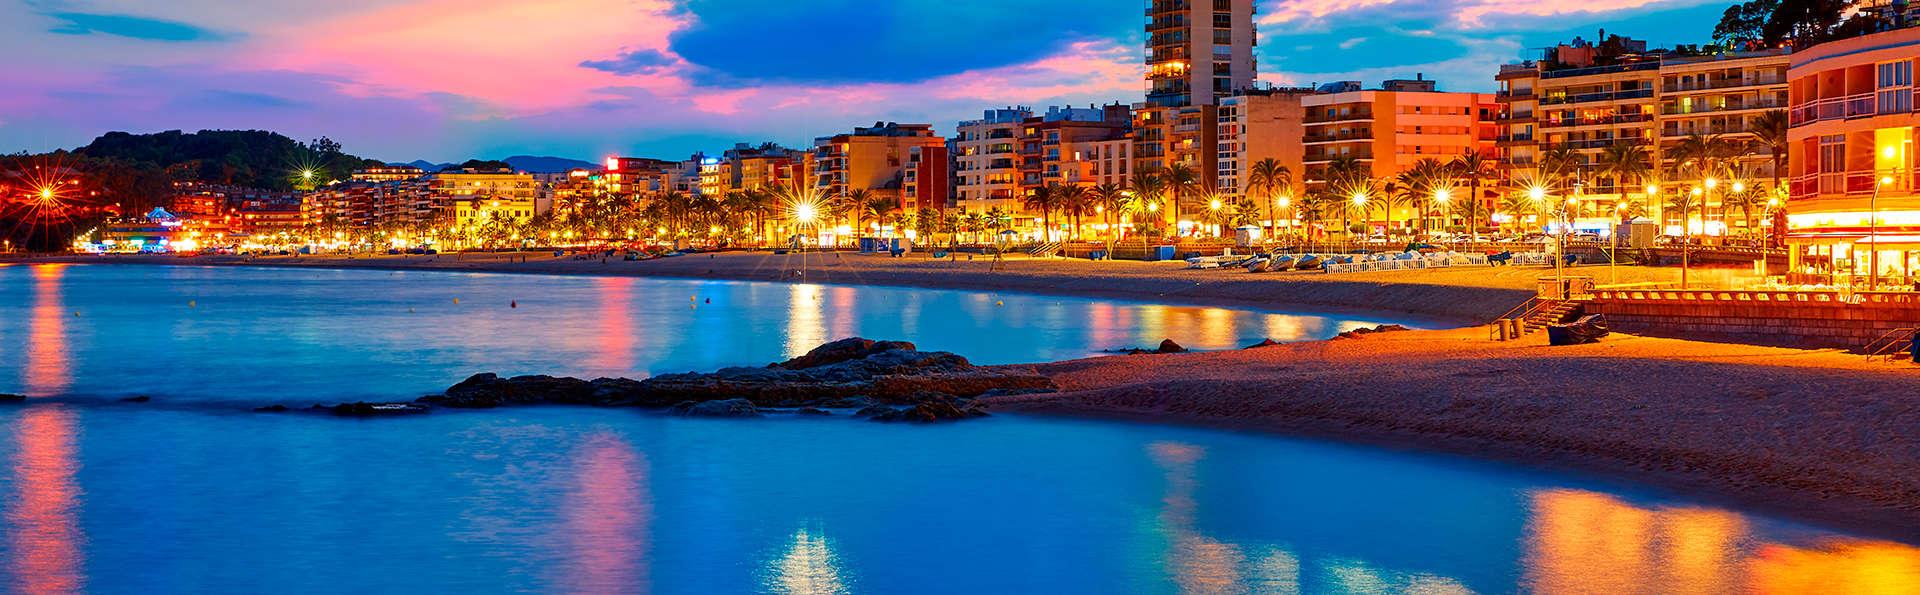 H Top Royal Beach - EDIT_destination3_13031.jpg